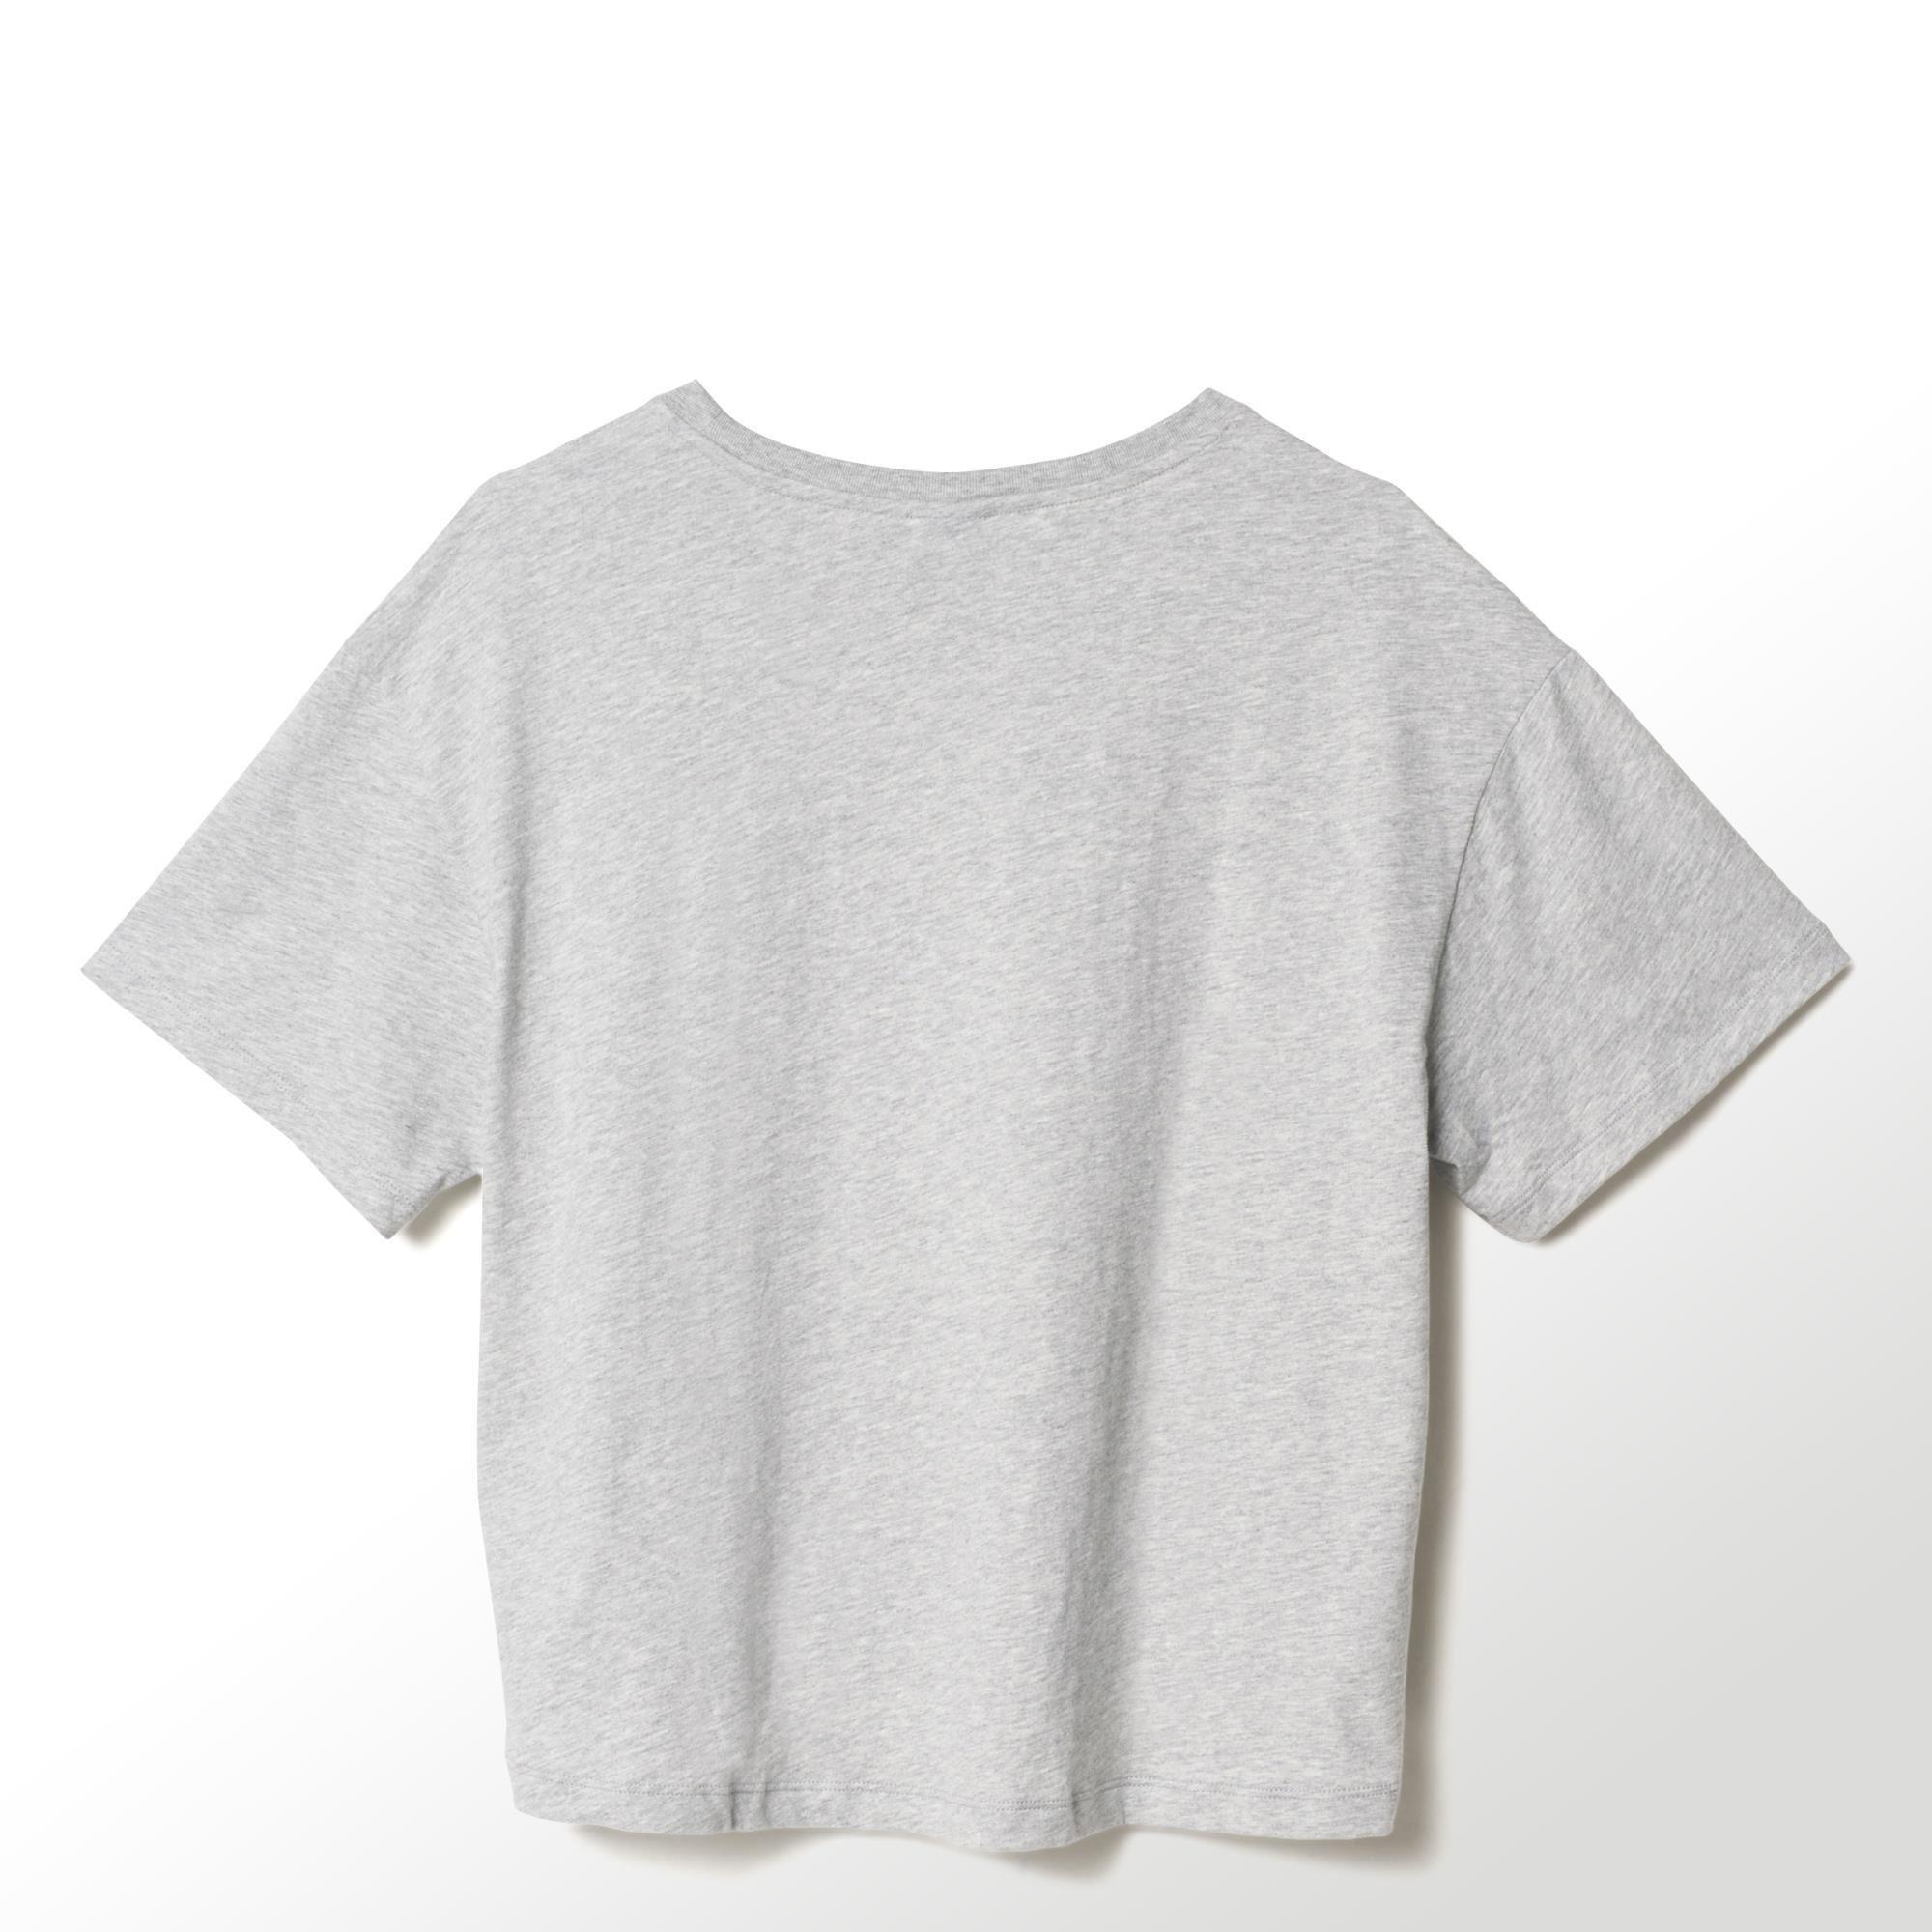 gris Camiseta Originals Adidas Mujer Tokio City nqBdXW5